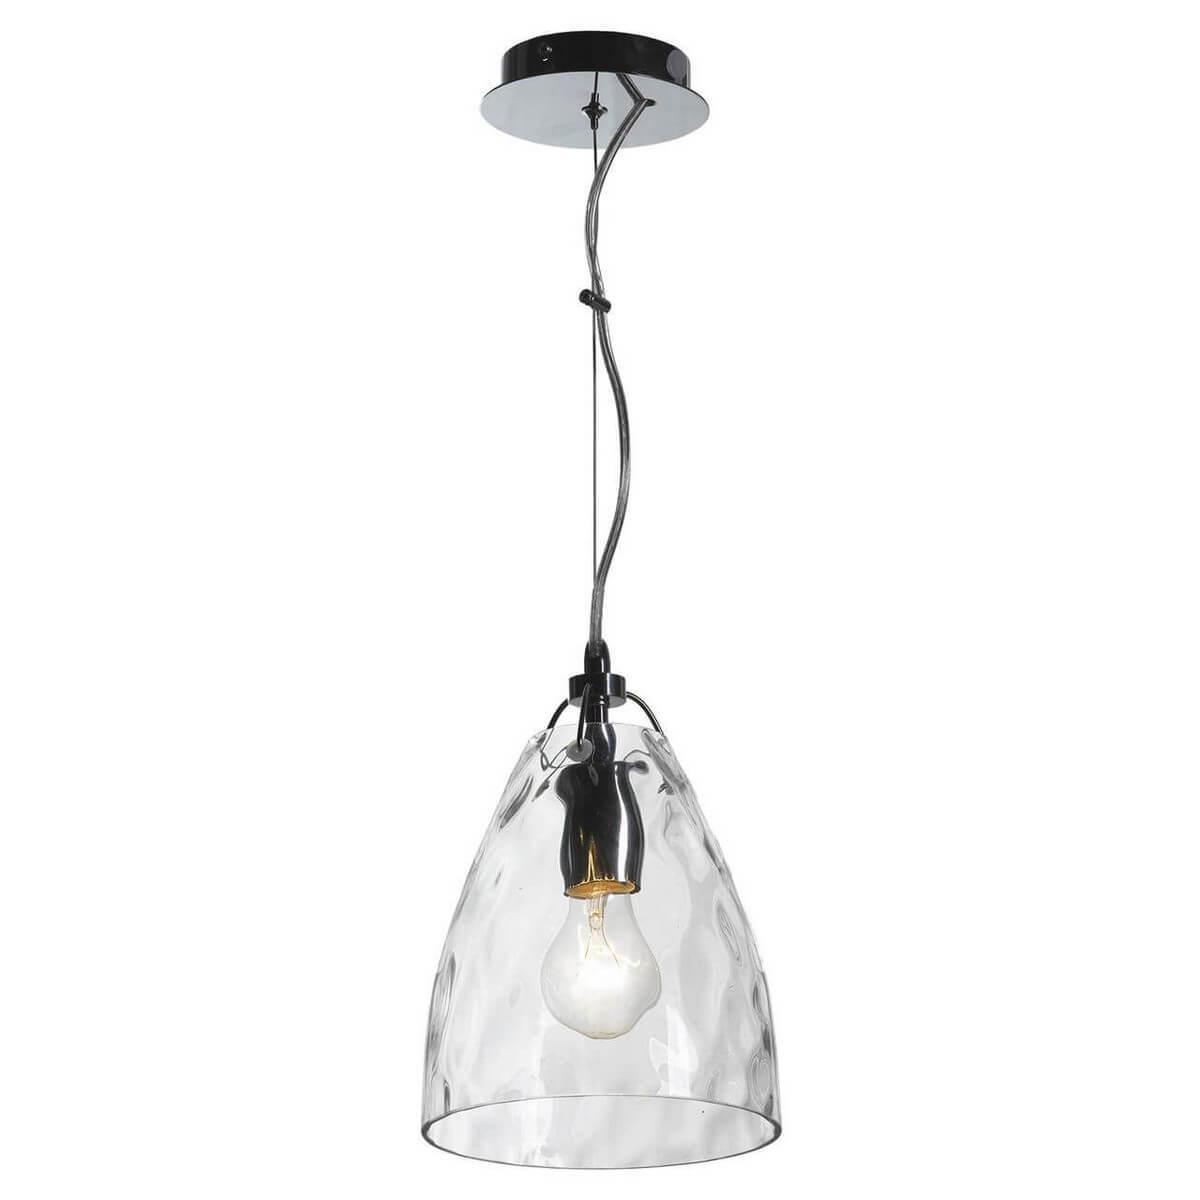 Подвесной светильник Lussole LOFT LSP-9630, E27, 60 Вт спот lussole loft lsp 9880 e27 60 вт